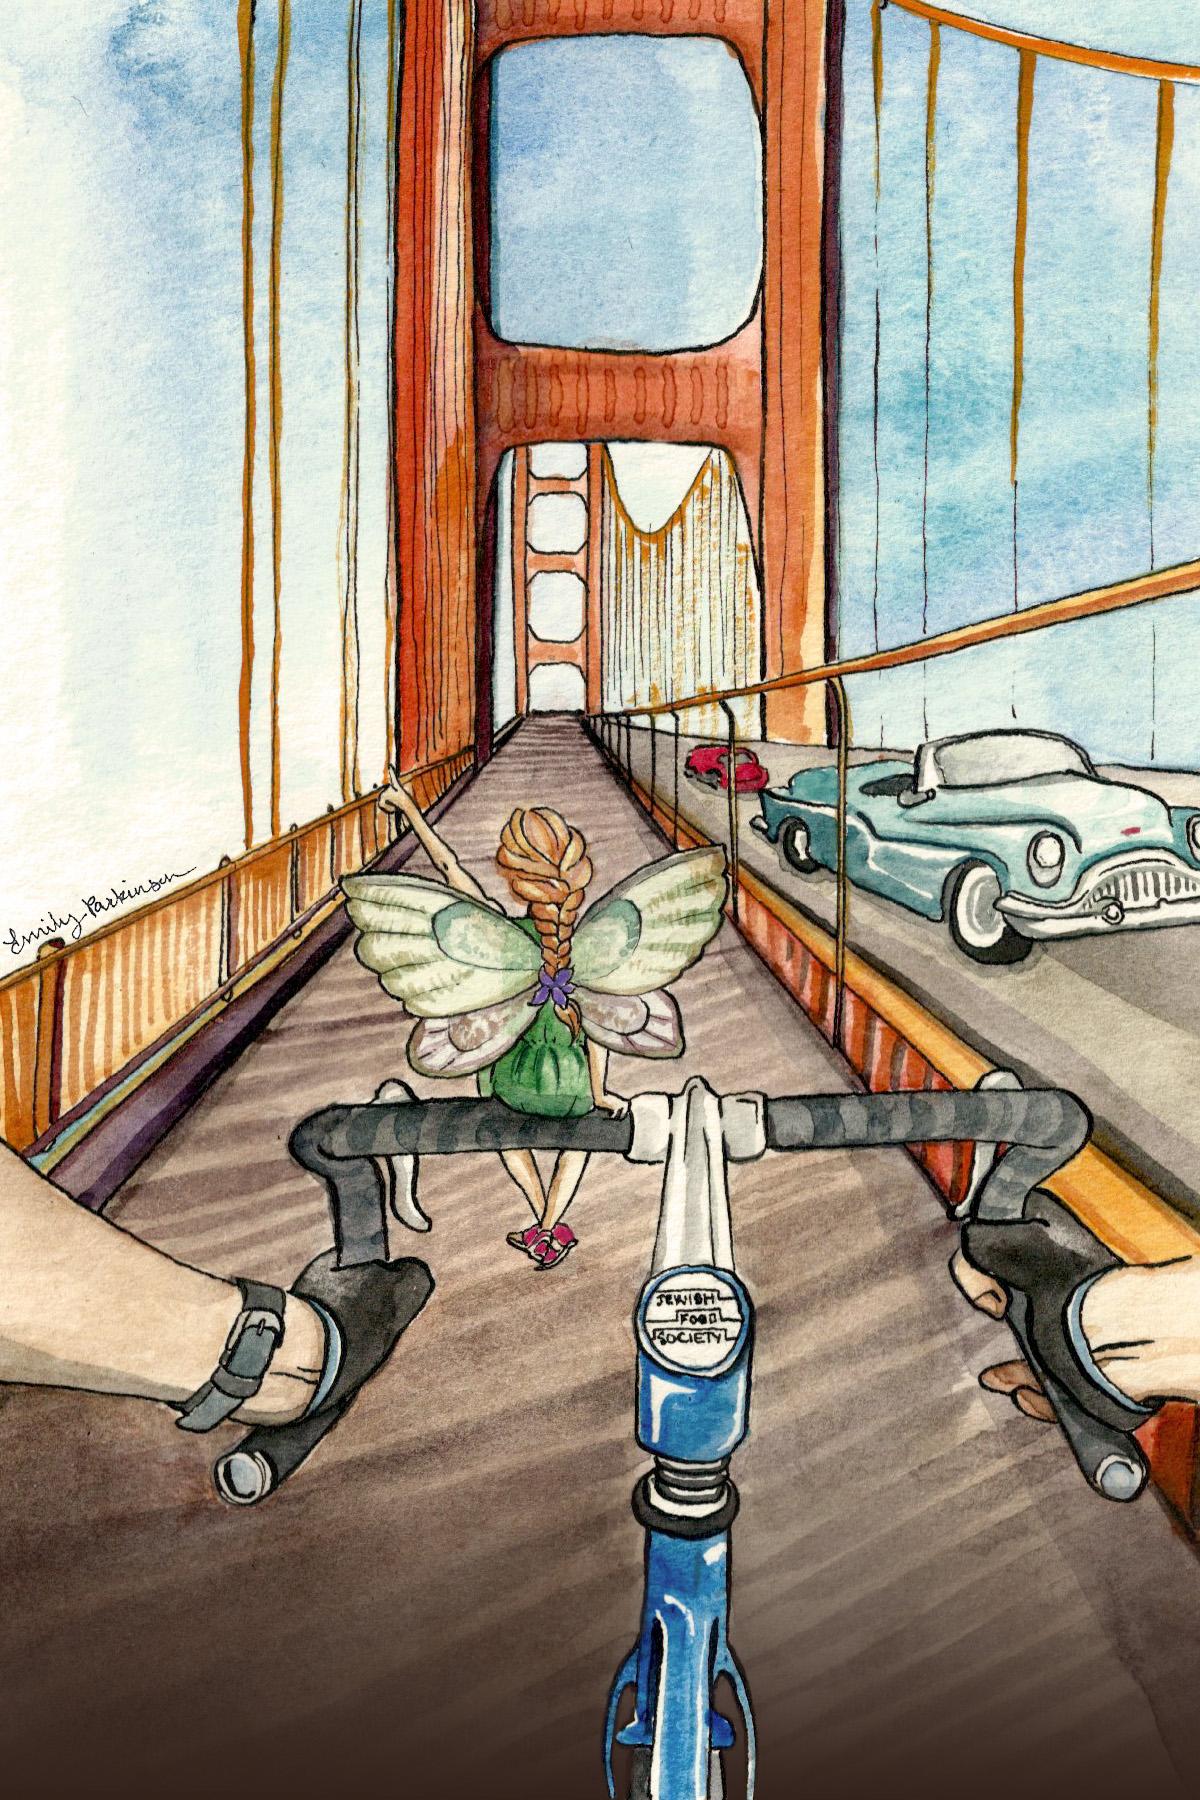 San Francisco Edition: Biking the Golden Gate